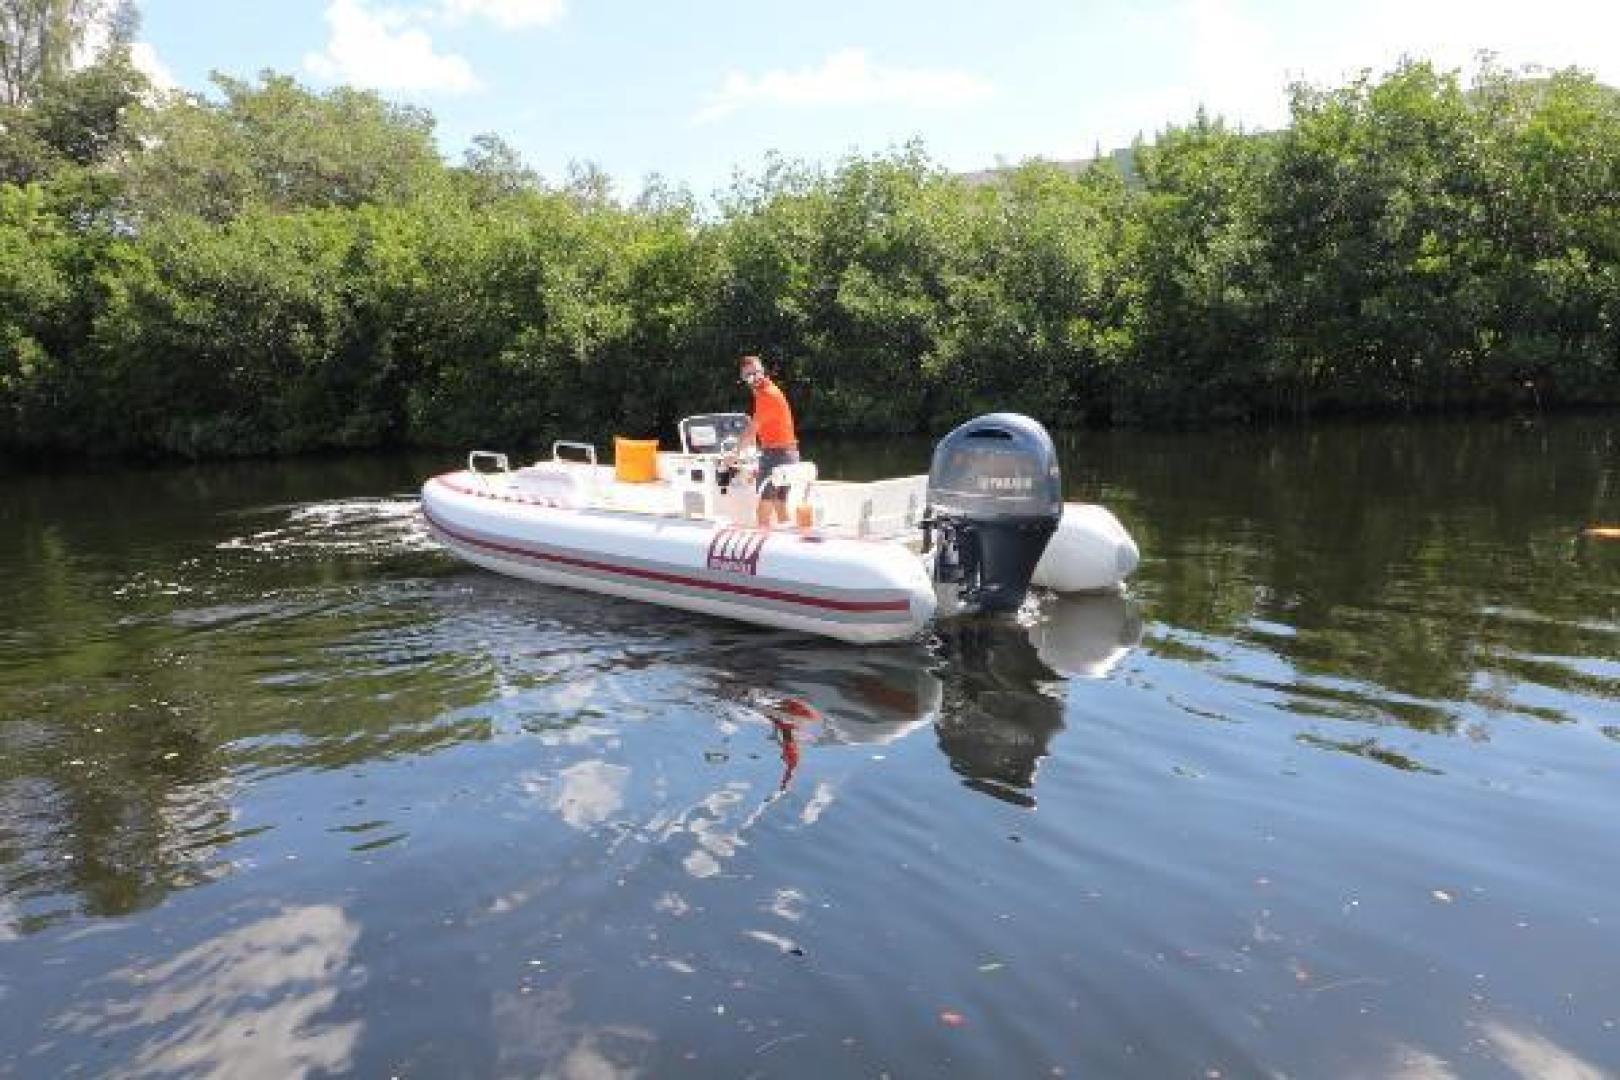 Novurania-Catamaran 24 2017-Novurania Catamaran 24 Fort Lauderdale-Florida-United States-1530845   Thumbnail